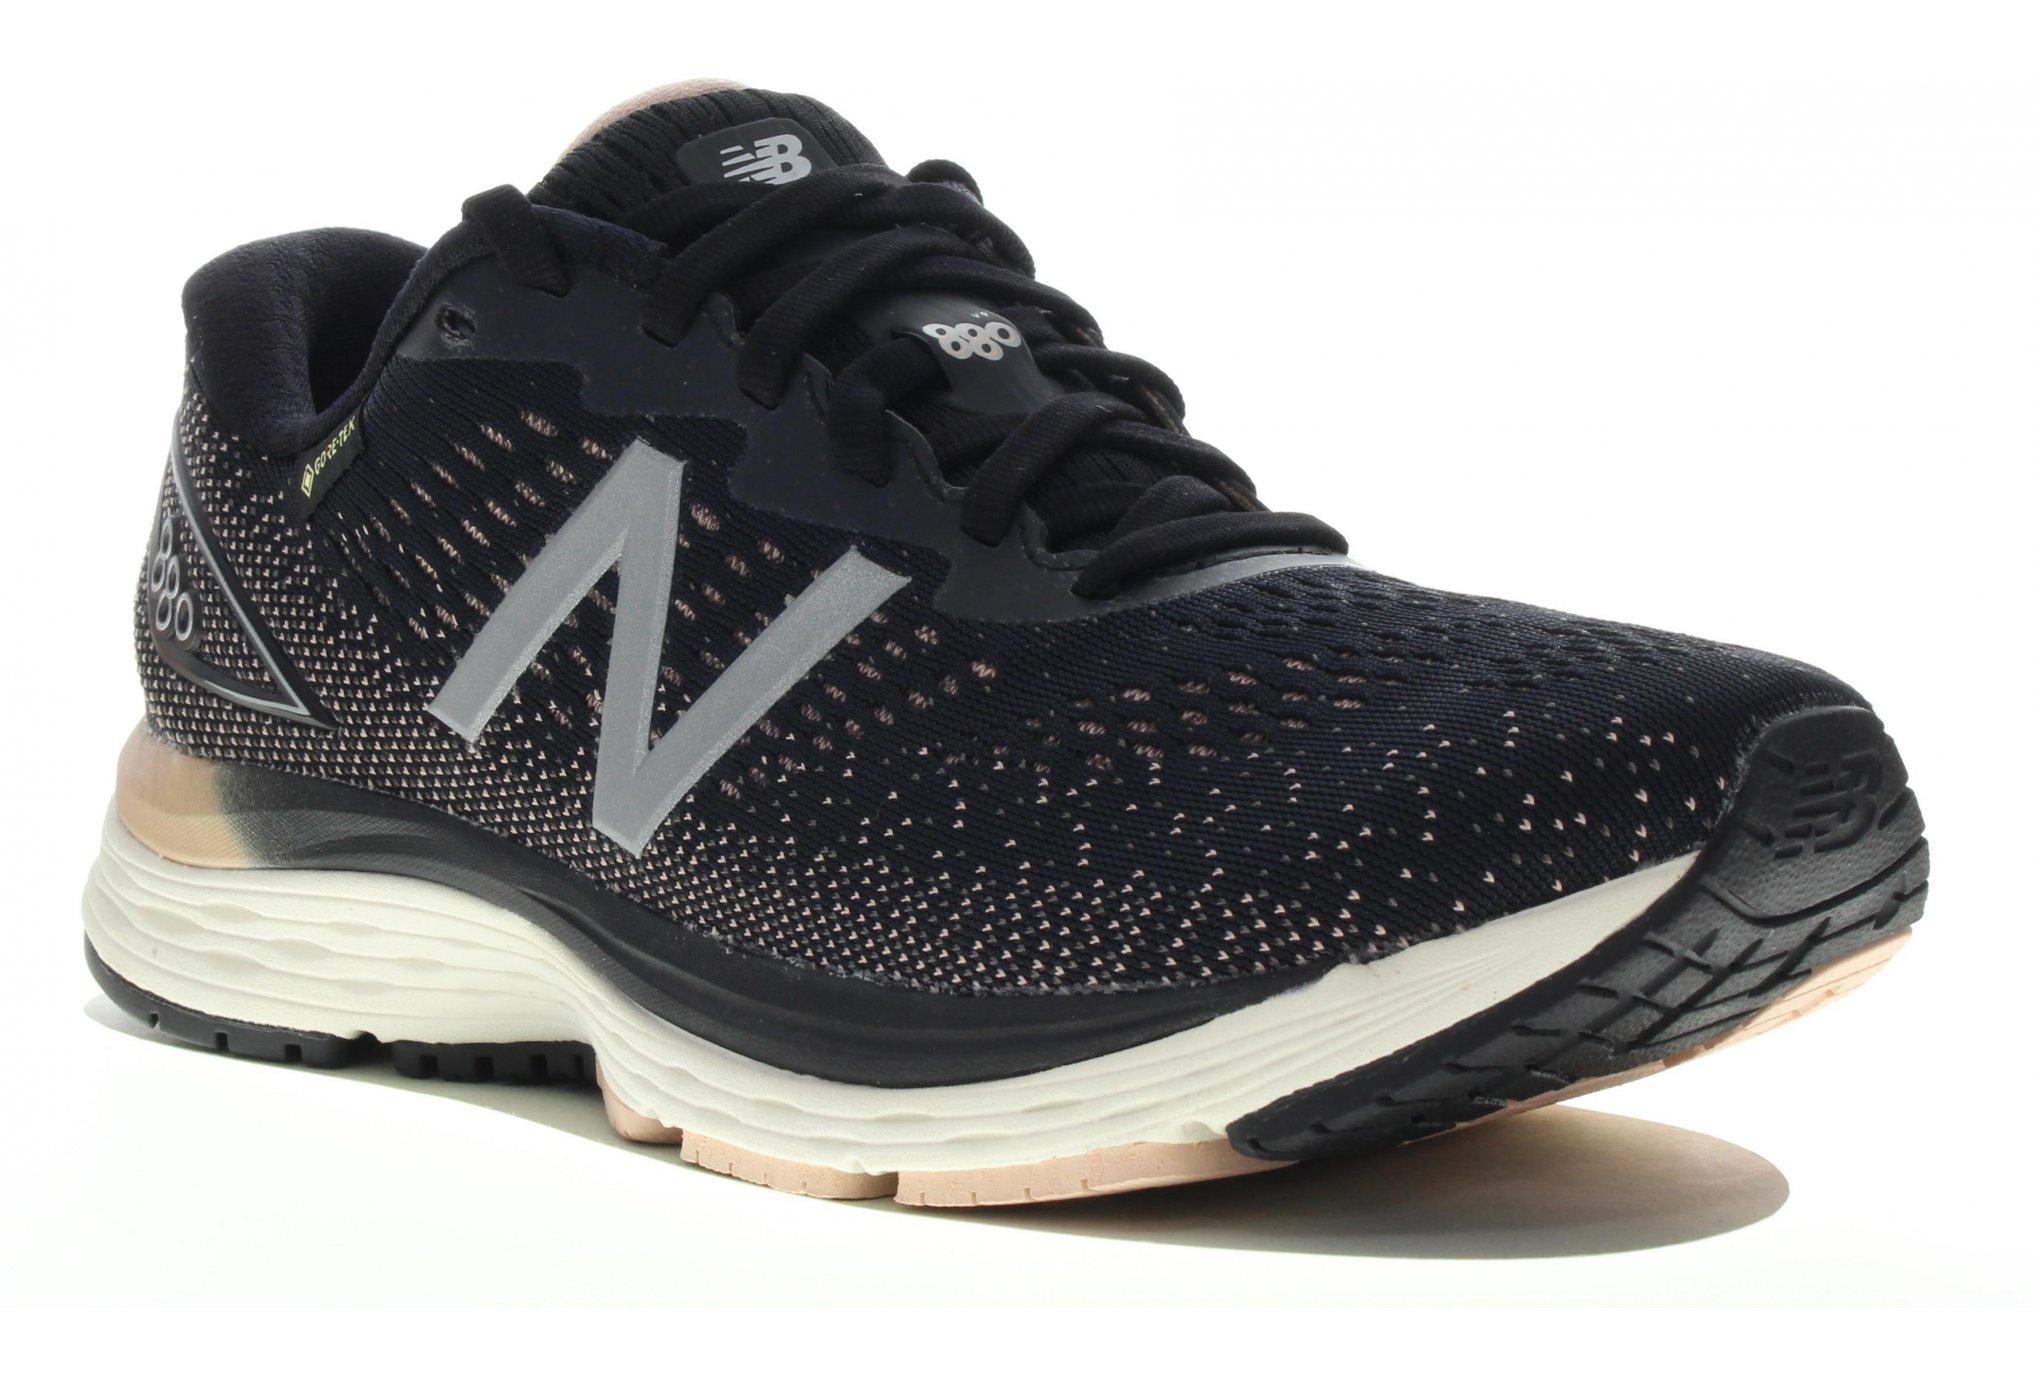 New Balance W 880 V9 Gore-Tex Diététique Chaussures femme